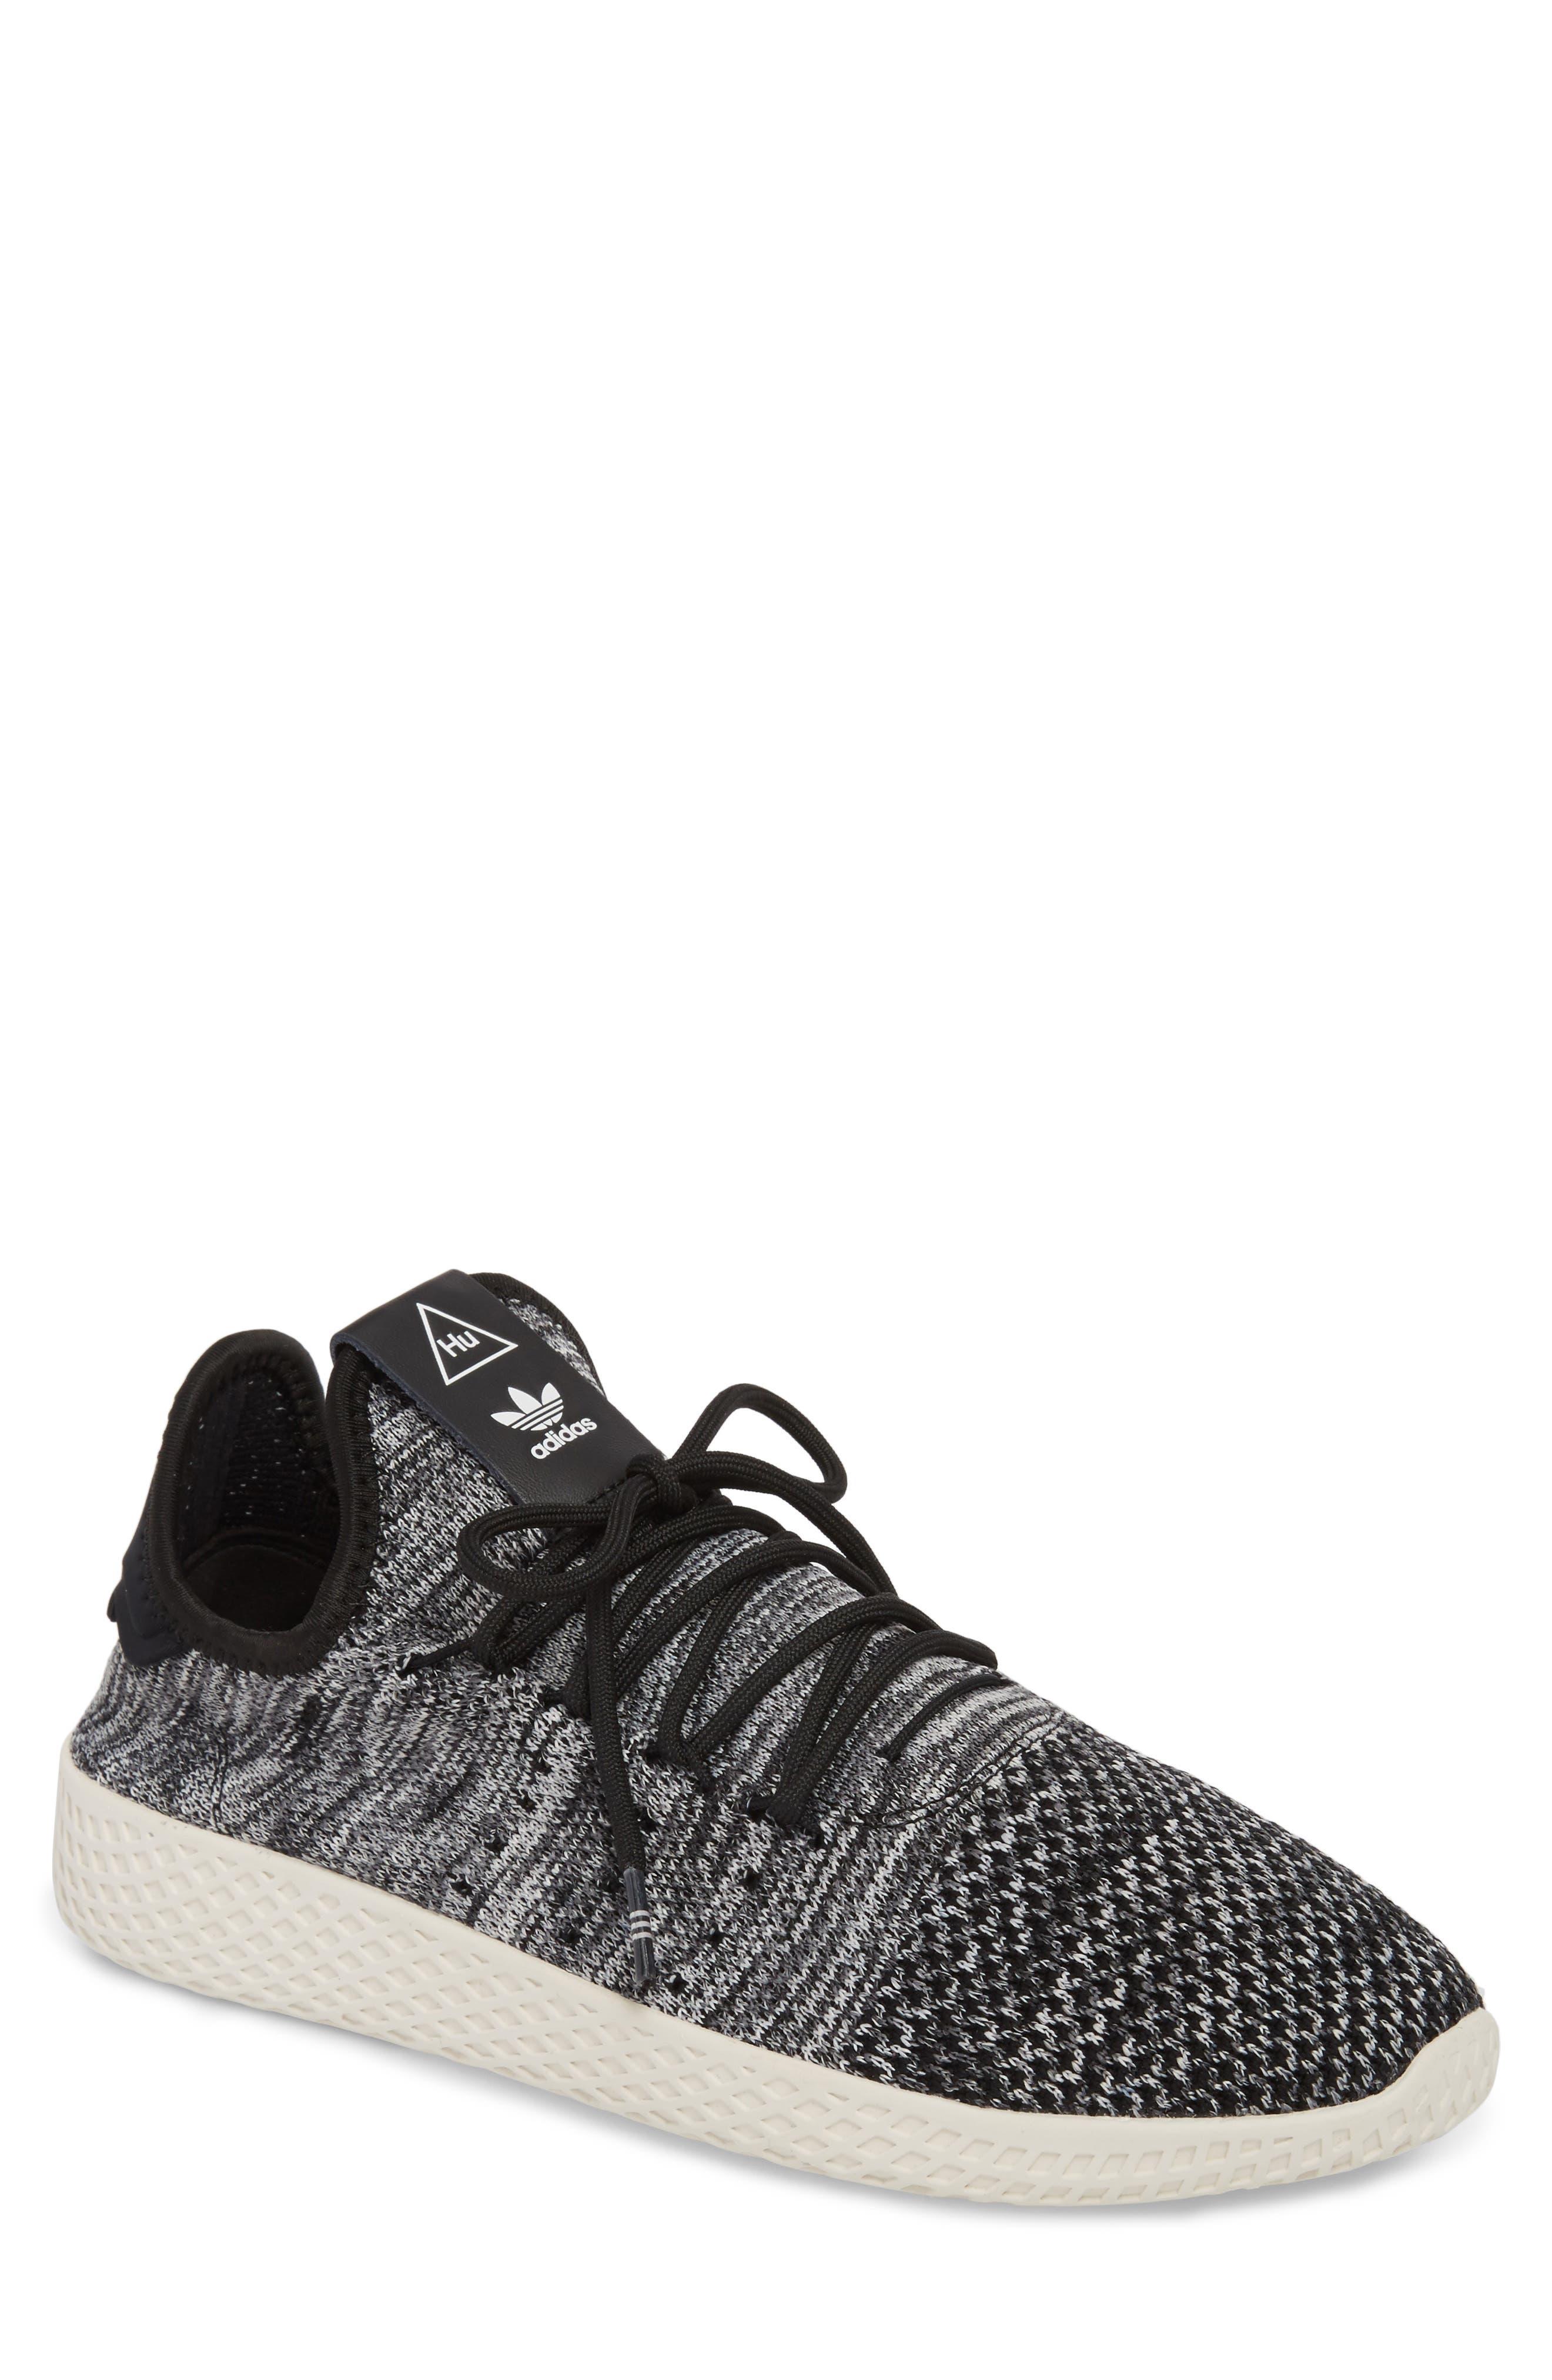 Pharrell Williams Tennis Hu Sneaker,                         Main,                         color, 020